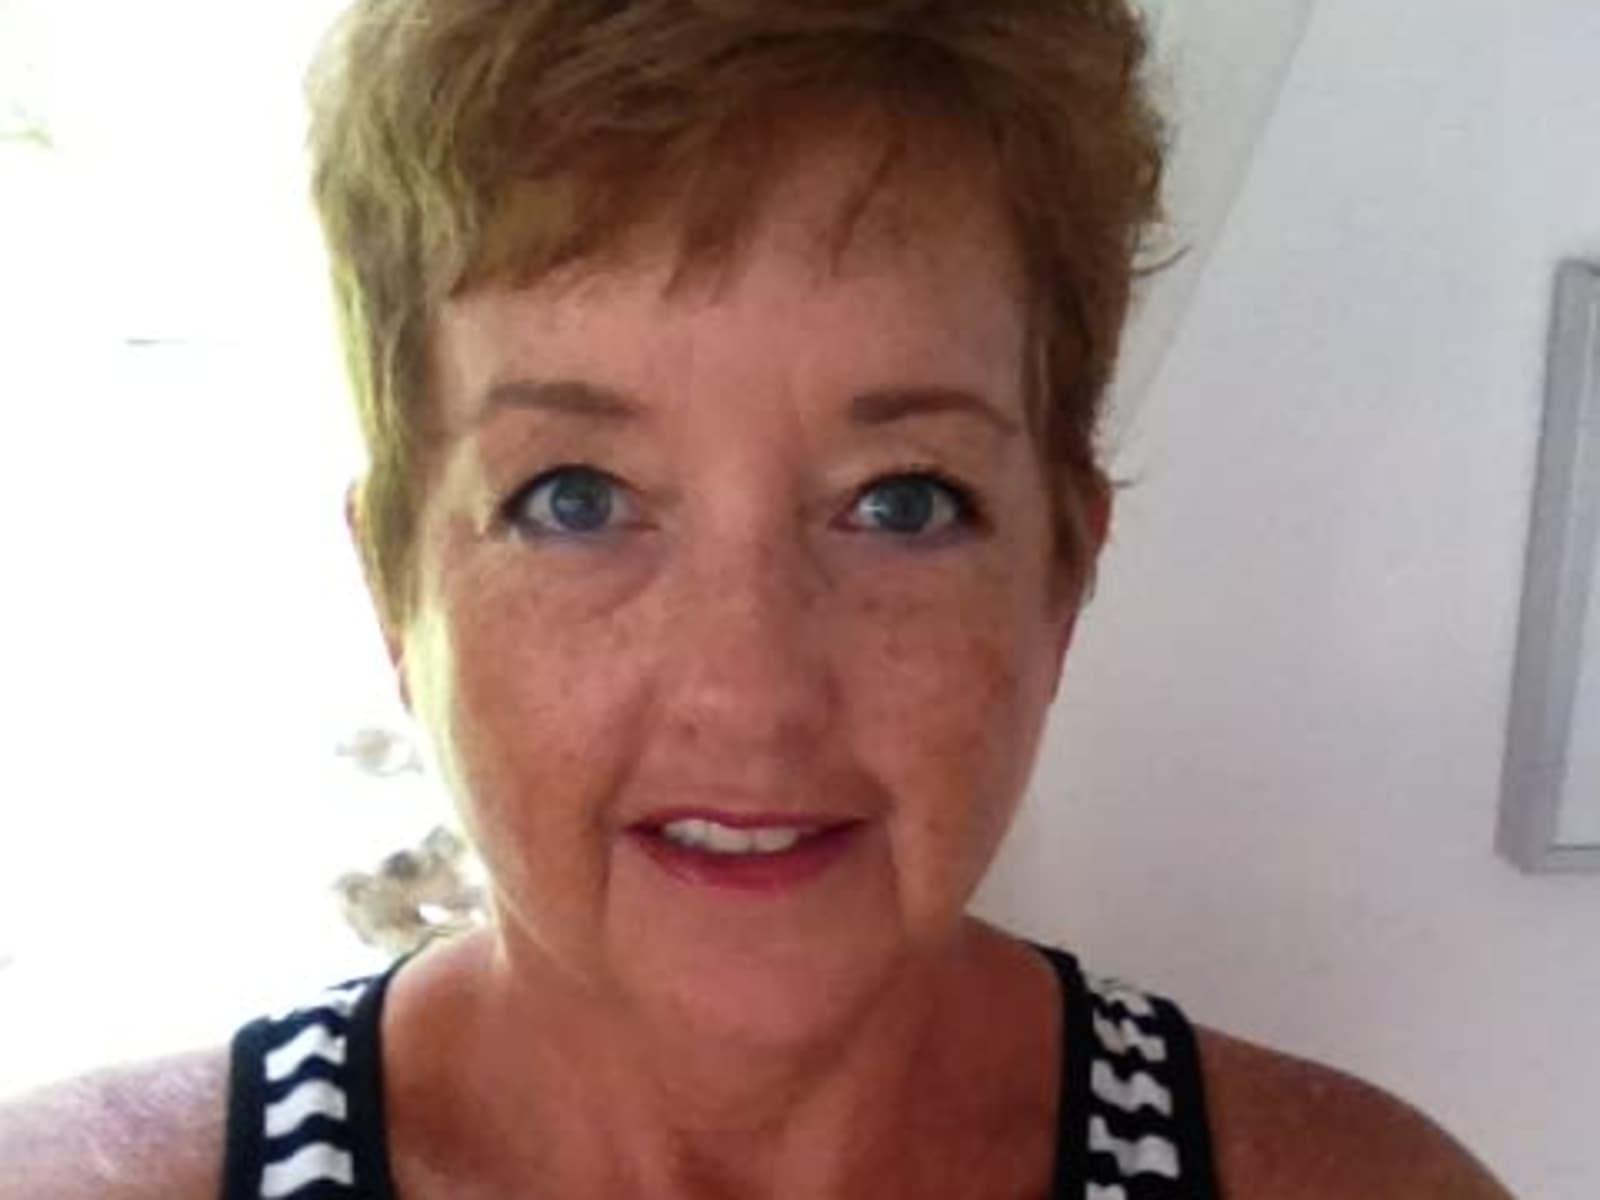 Angela from Kailua, Hawaii, United States